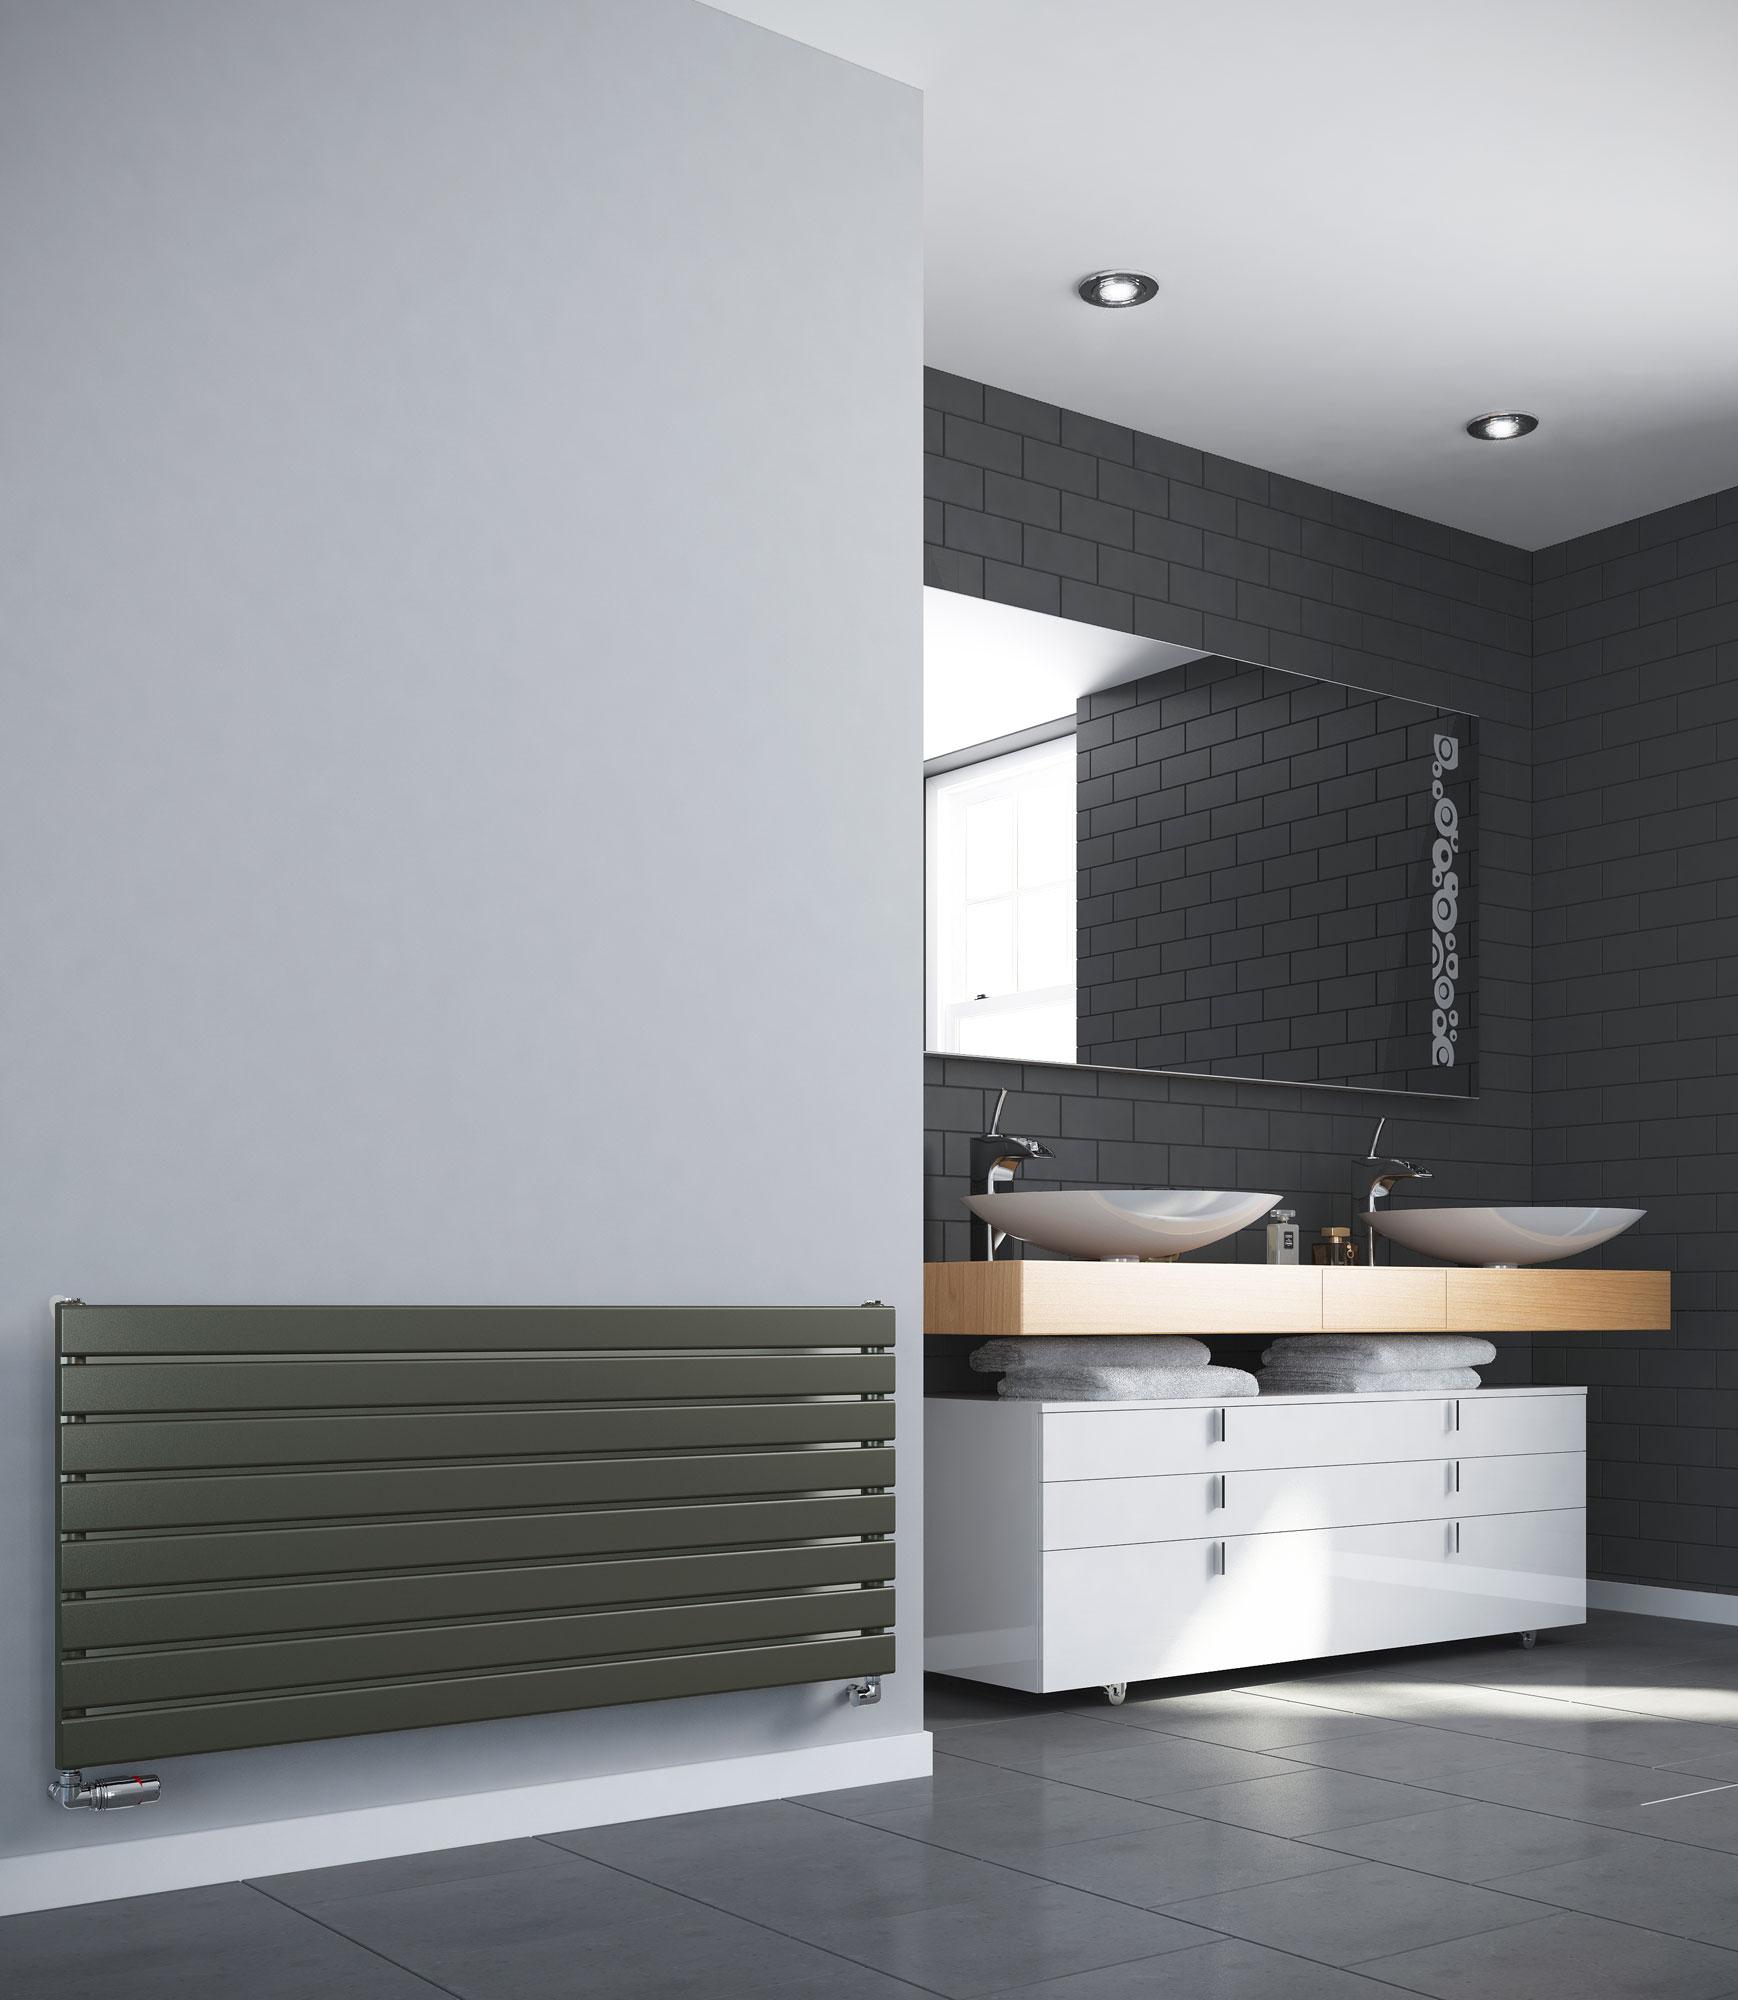 Novus Single Panel Designer Radiator - Sidato